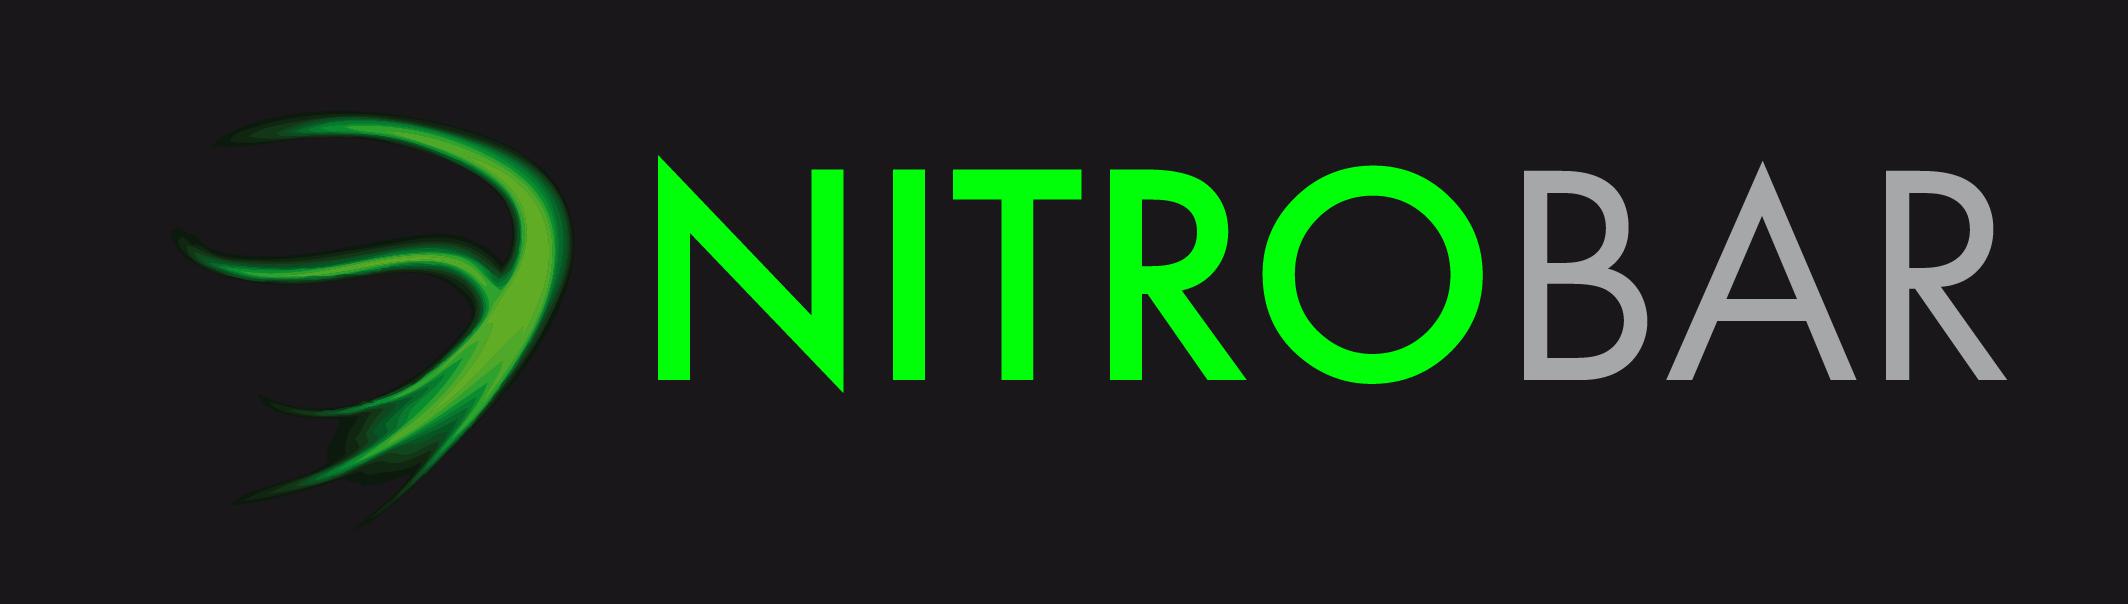 NitroBar